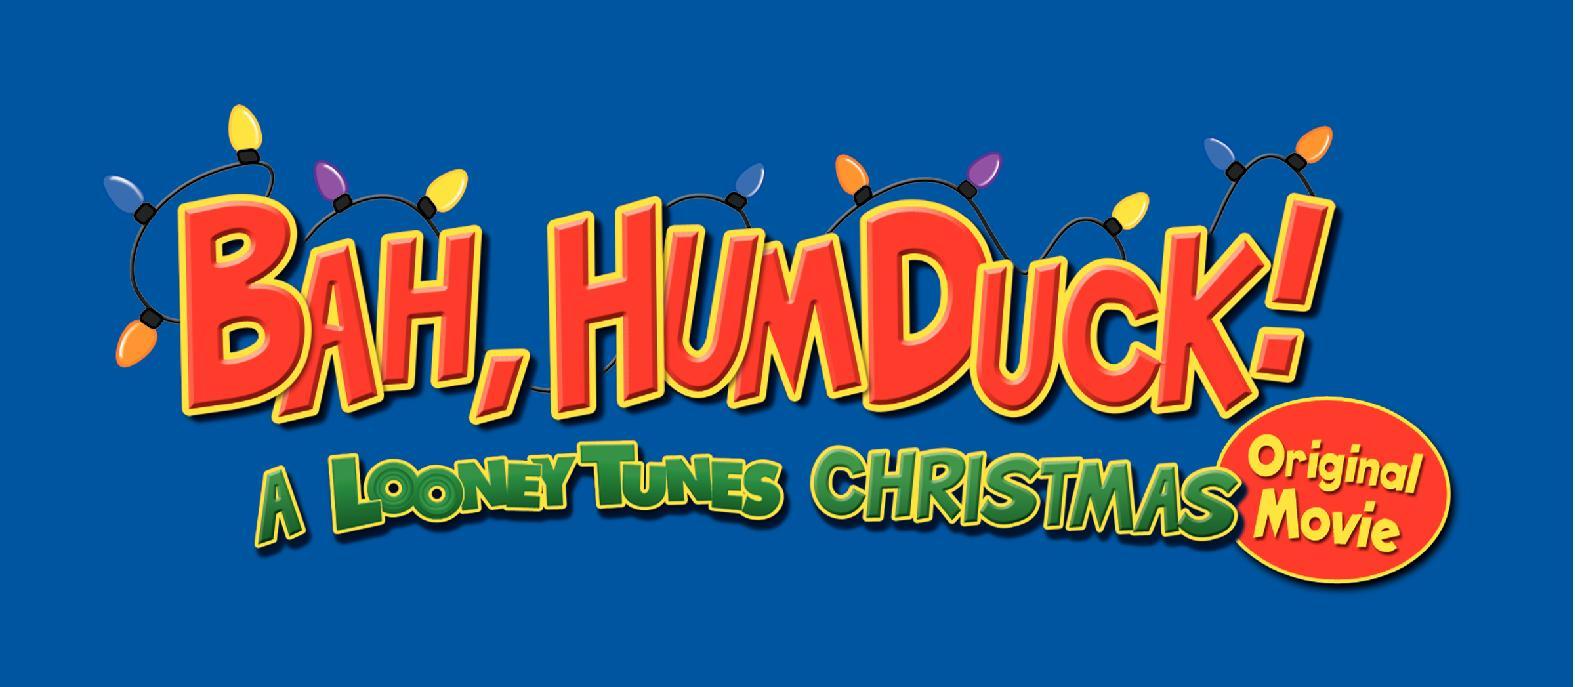 Bah Humduck A Looney Tunes Christmas.Bah Humduck A Looney Tunes Christmas Wikipedia